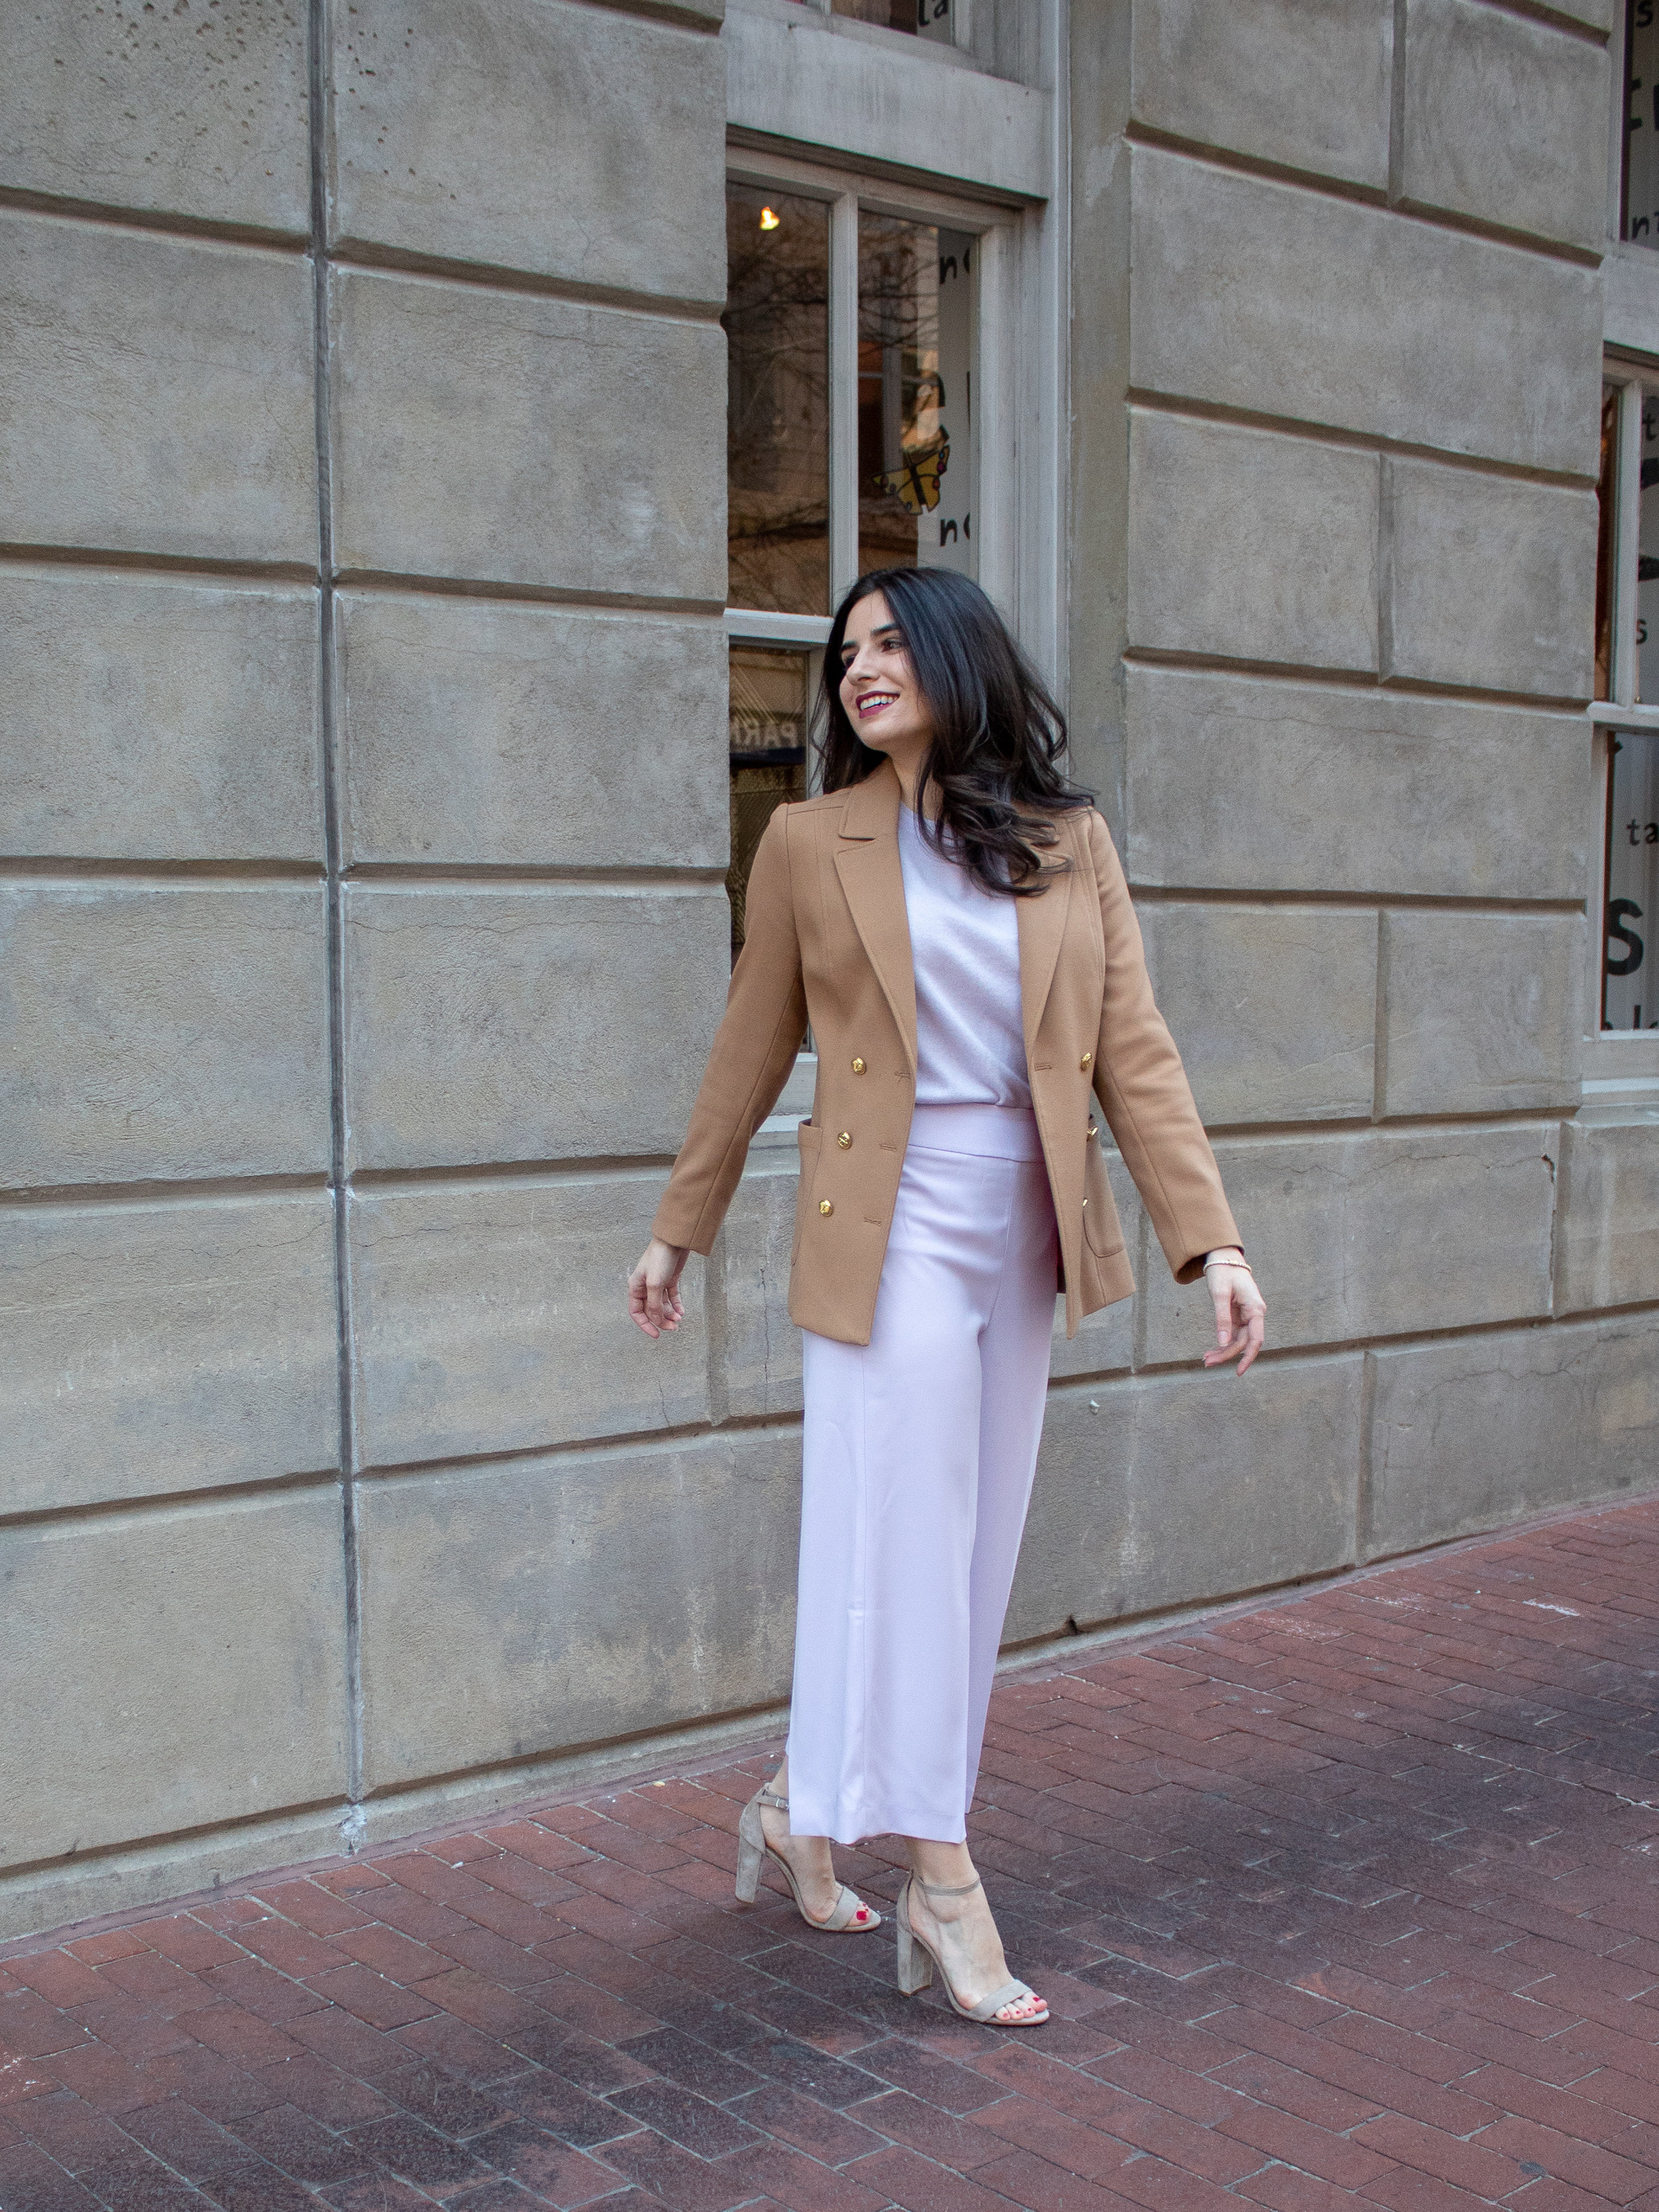 Sweater:  Pure , Bottoms:  Express (lilac purple) , Shoes:  Similar, Nordstrom, Sam Edelman , Blazer:  Similar, Ralph Lauren, Macy's